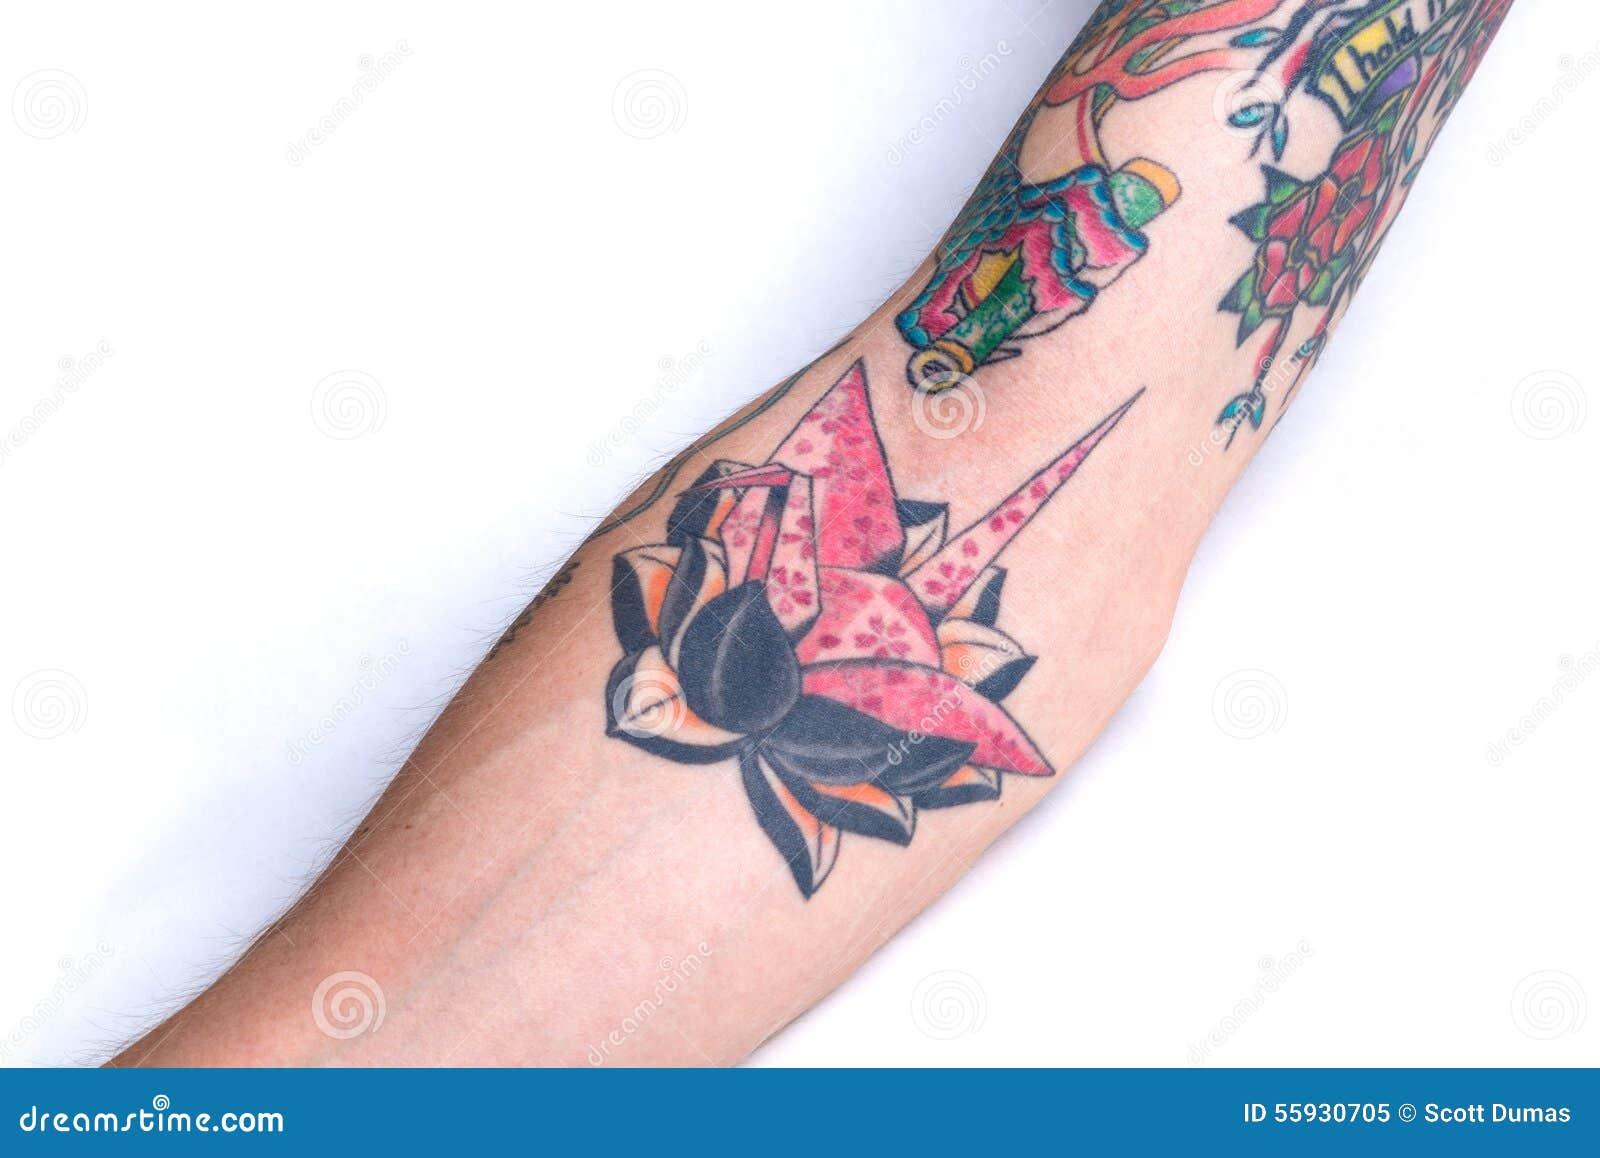 Crane Black Lotus Forearm Tattoo Rose Image Stock Image Du Bras